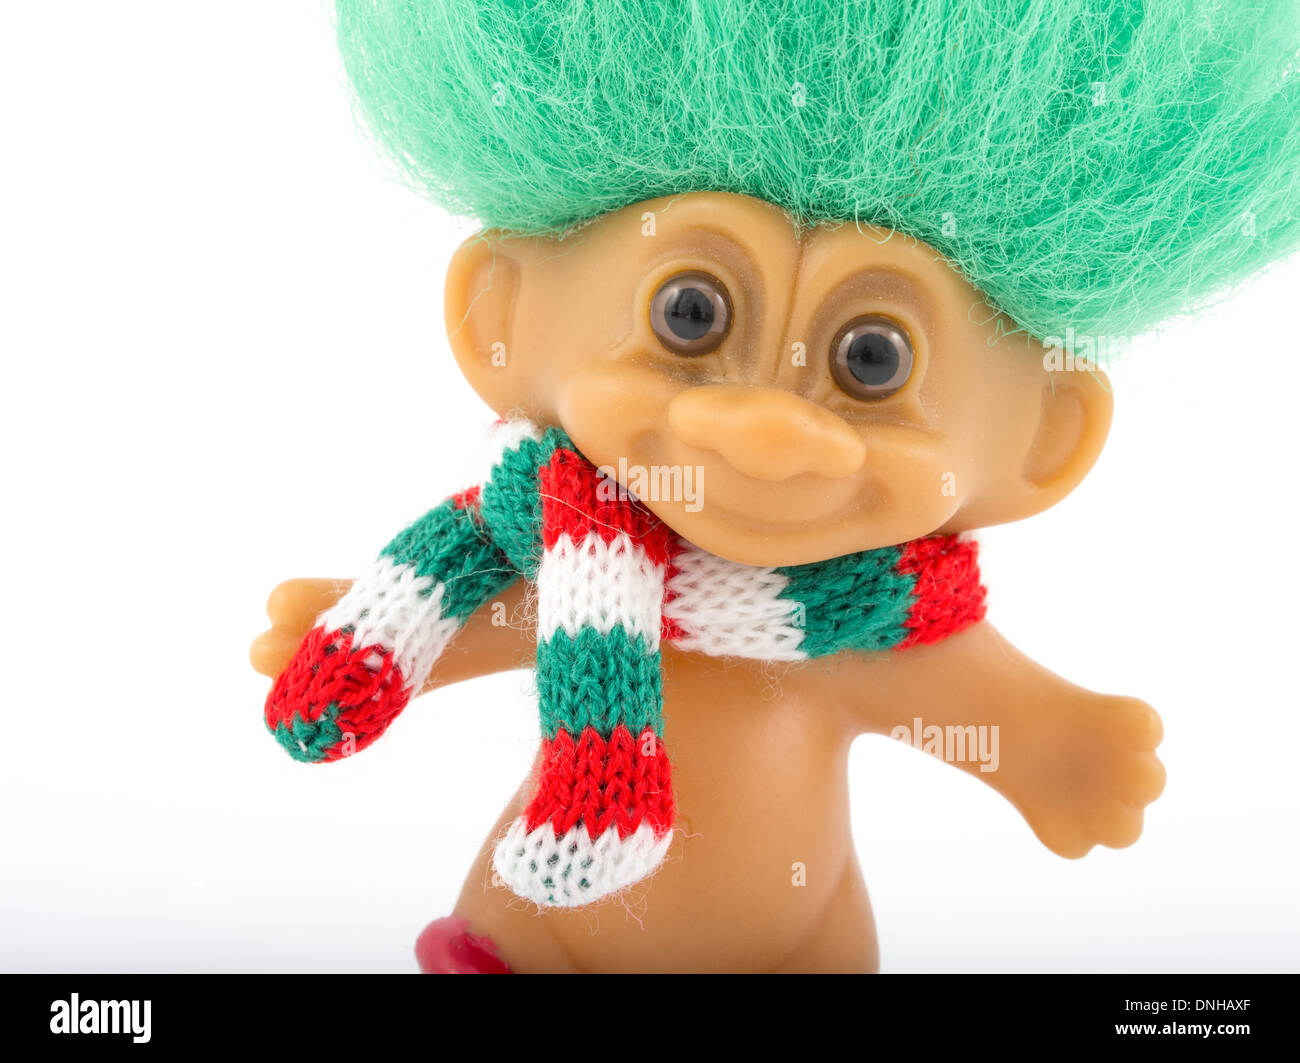 Troll Doll aka Dam Doll first created 1959 by Thomas Dam. - Stock Image